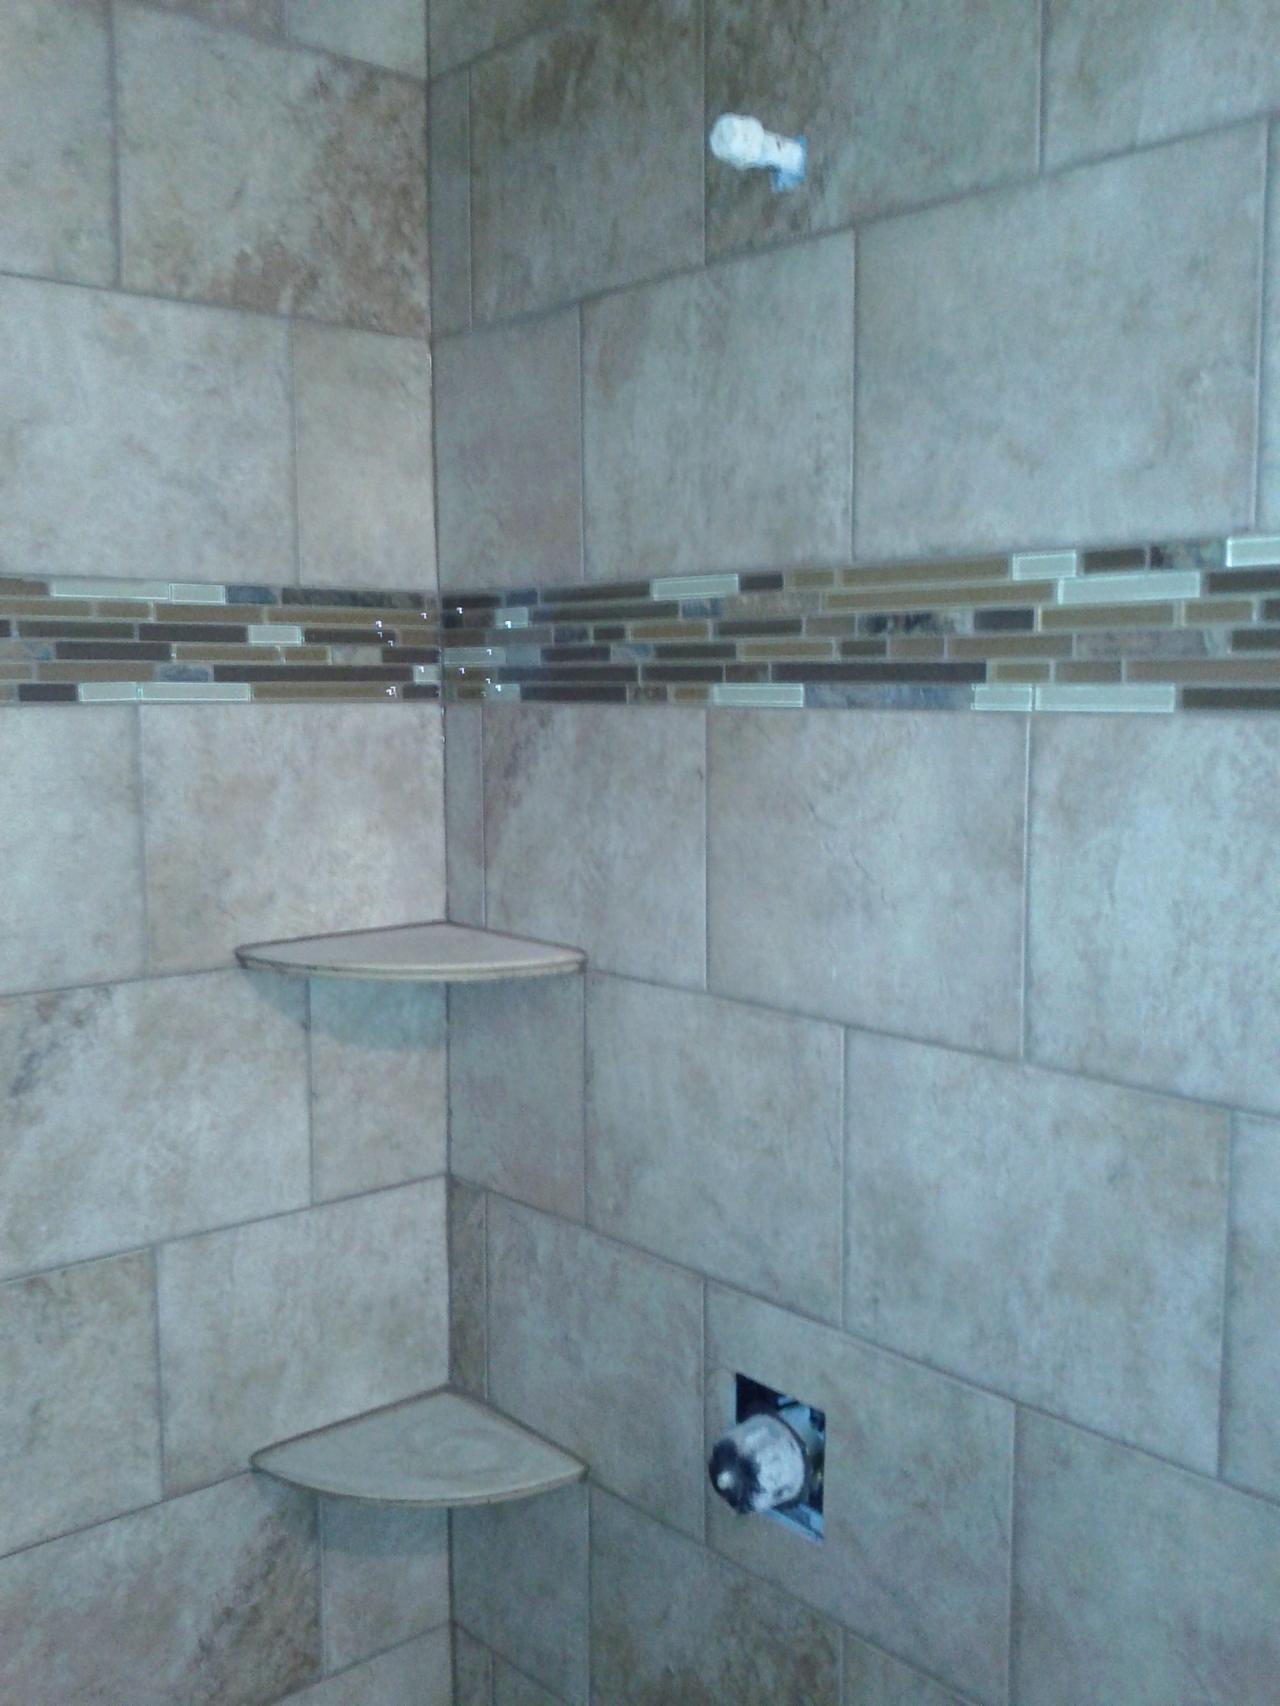 Ceramic Bathroom Tile Bathroom Shower Tile - Show1s.com